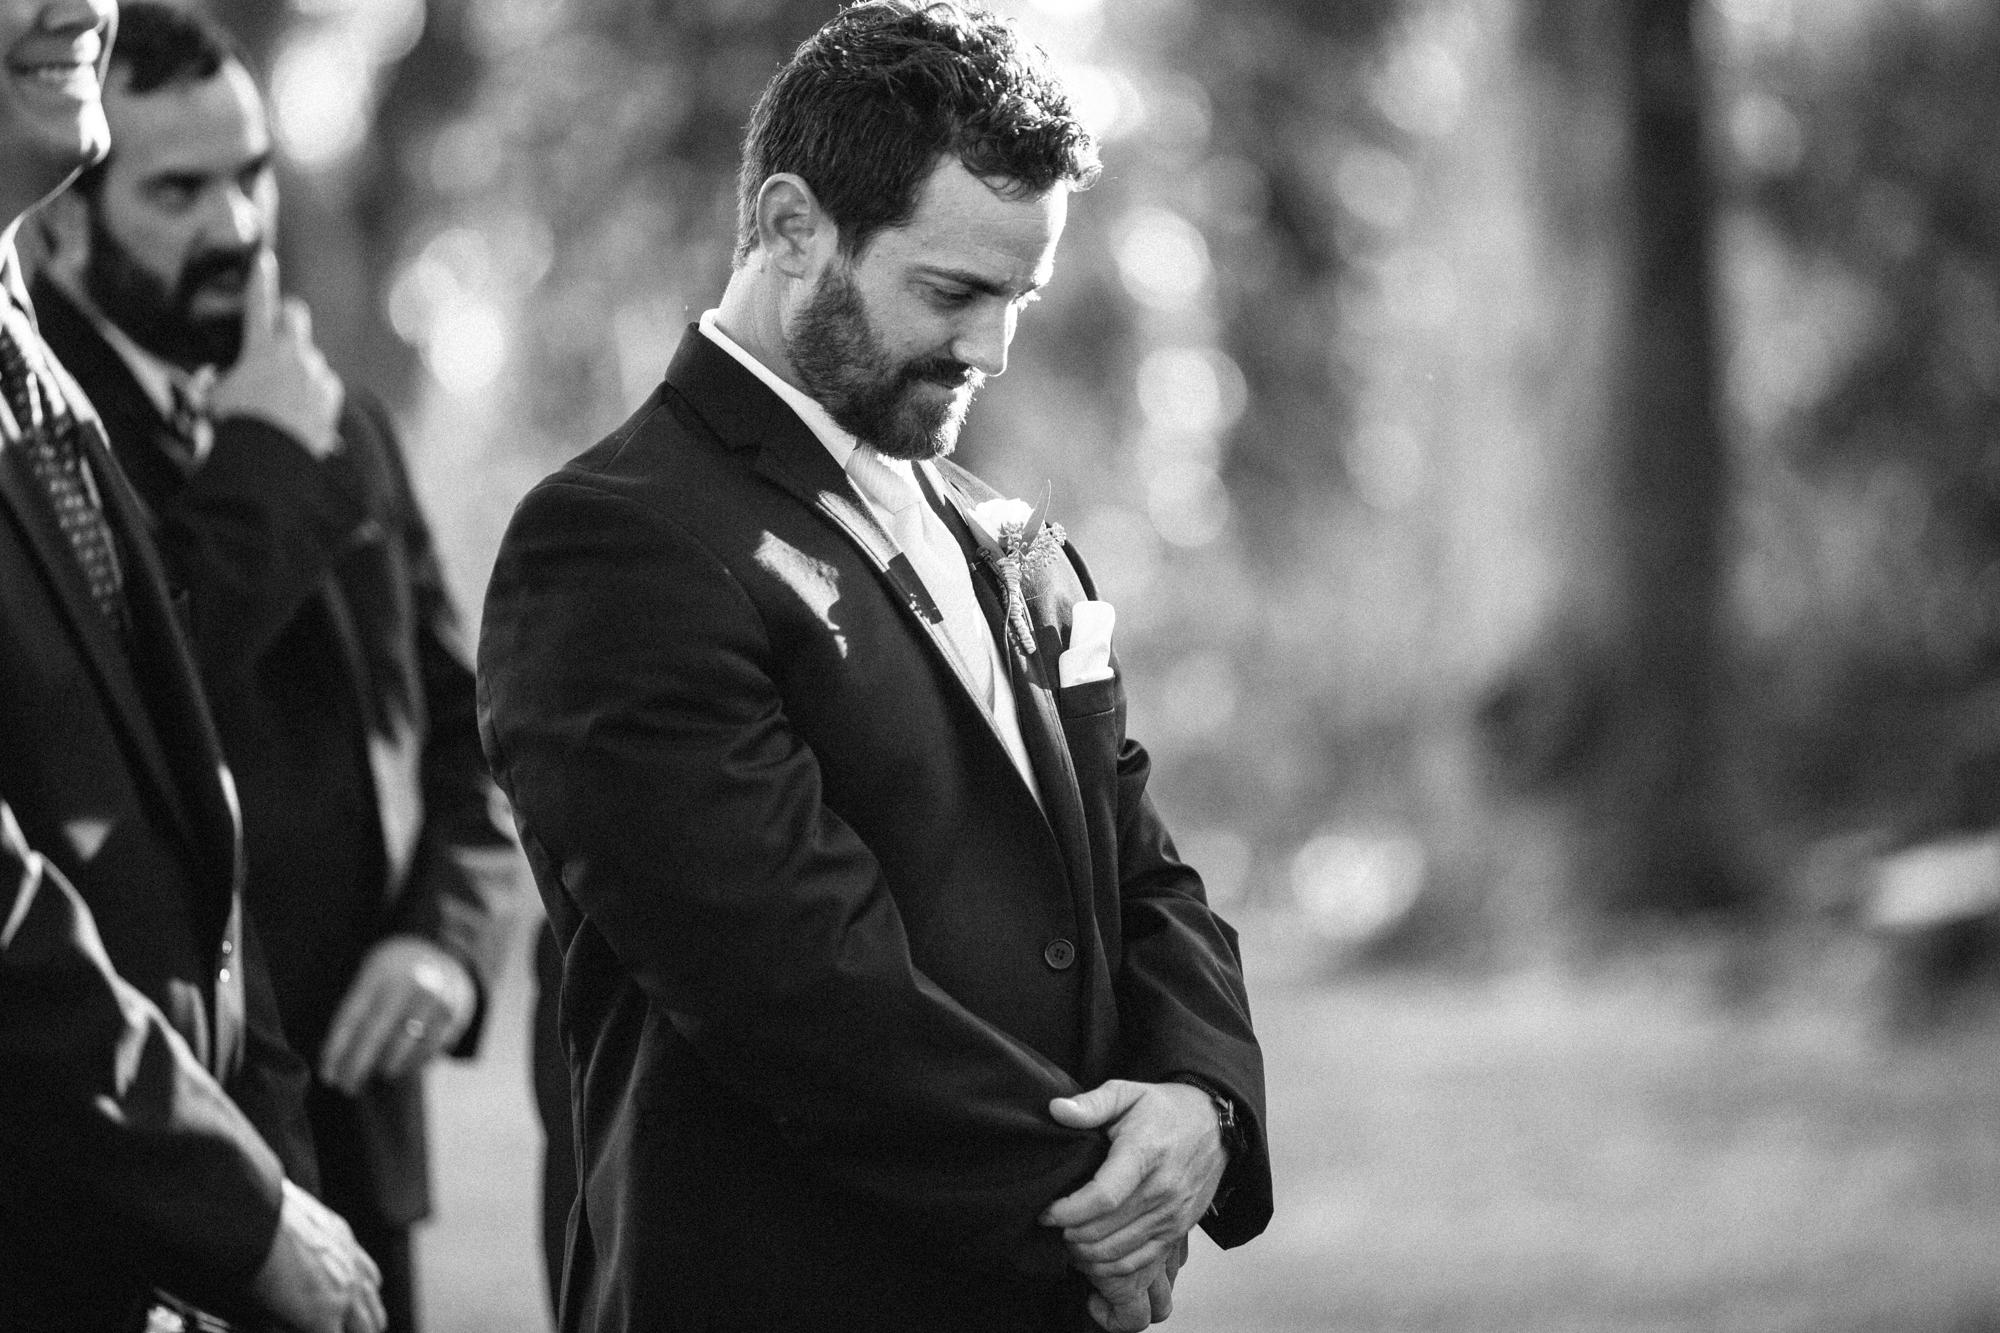 Gautier_Wedding_Photographer-95.jpg